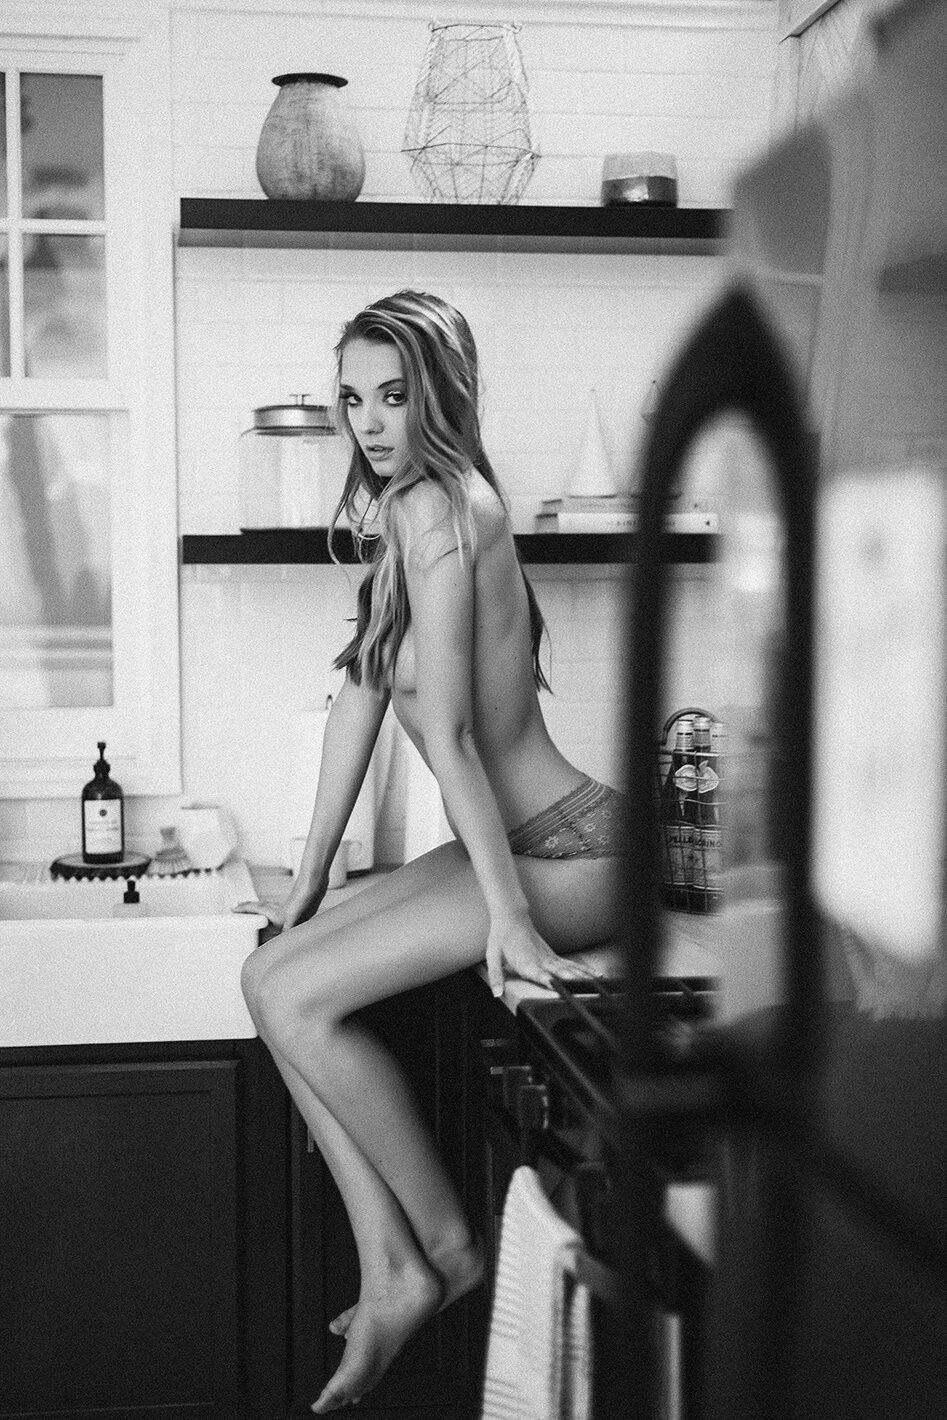 Morgan fletchall lingerie - 2019 year